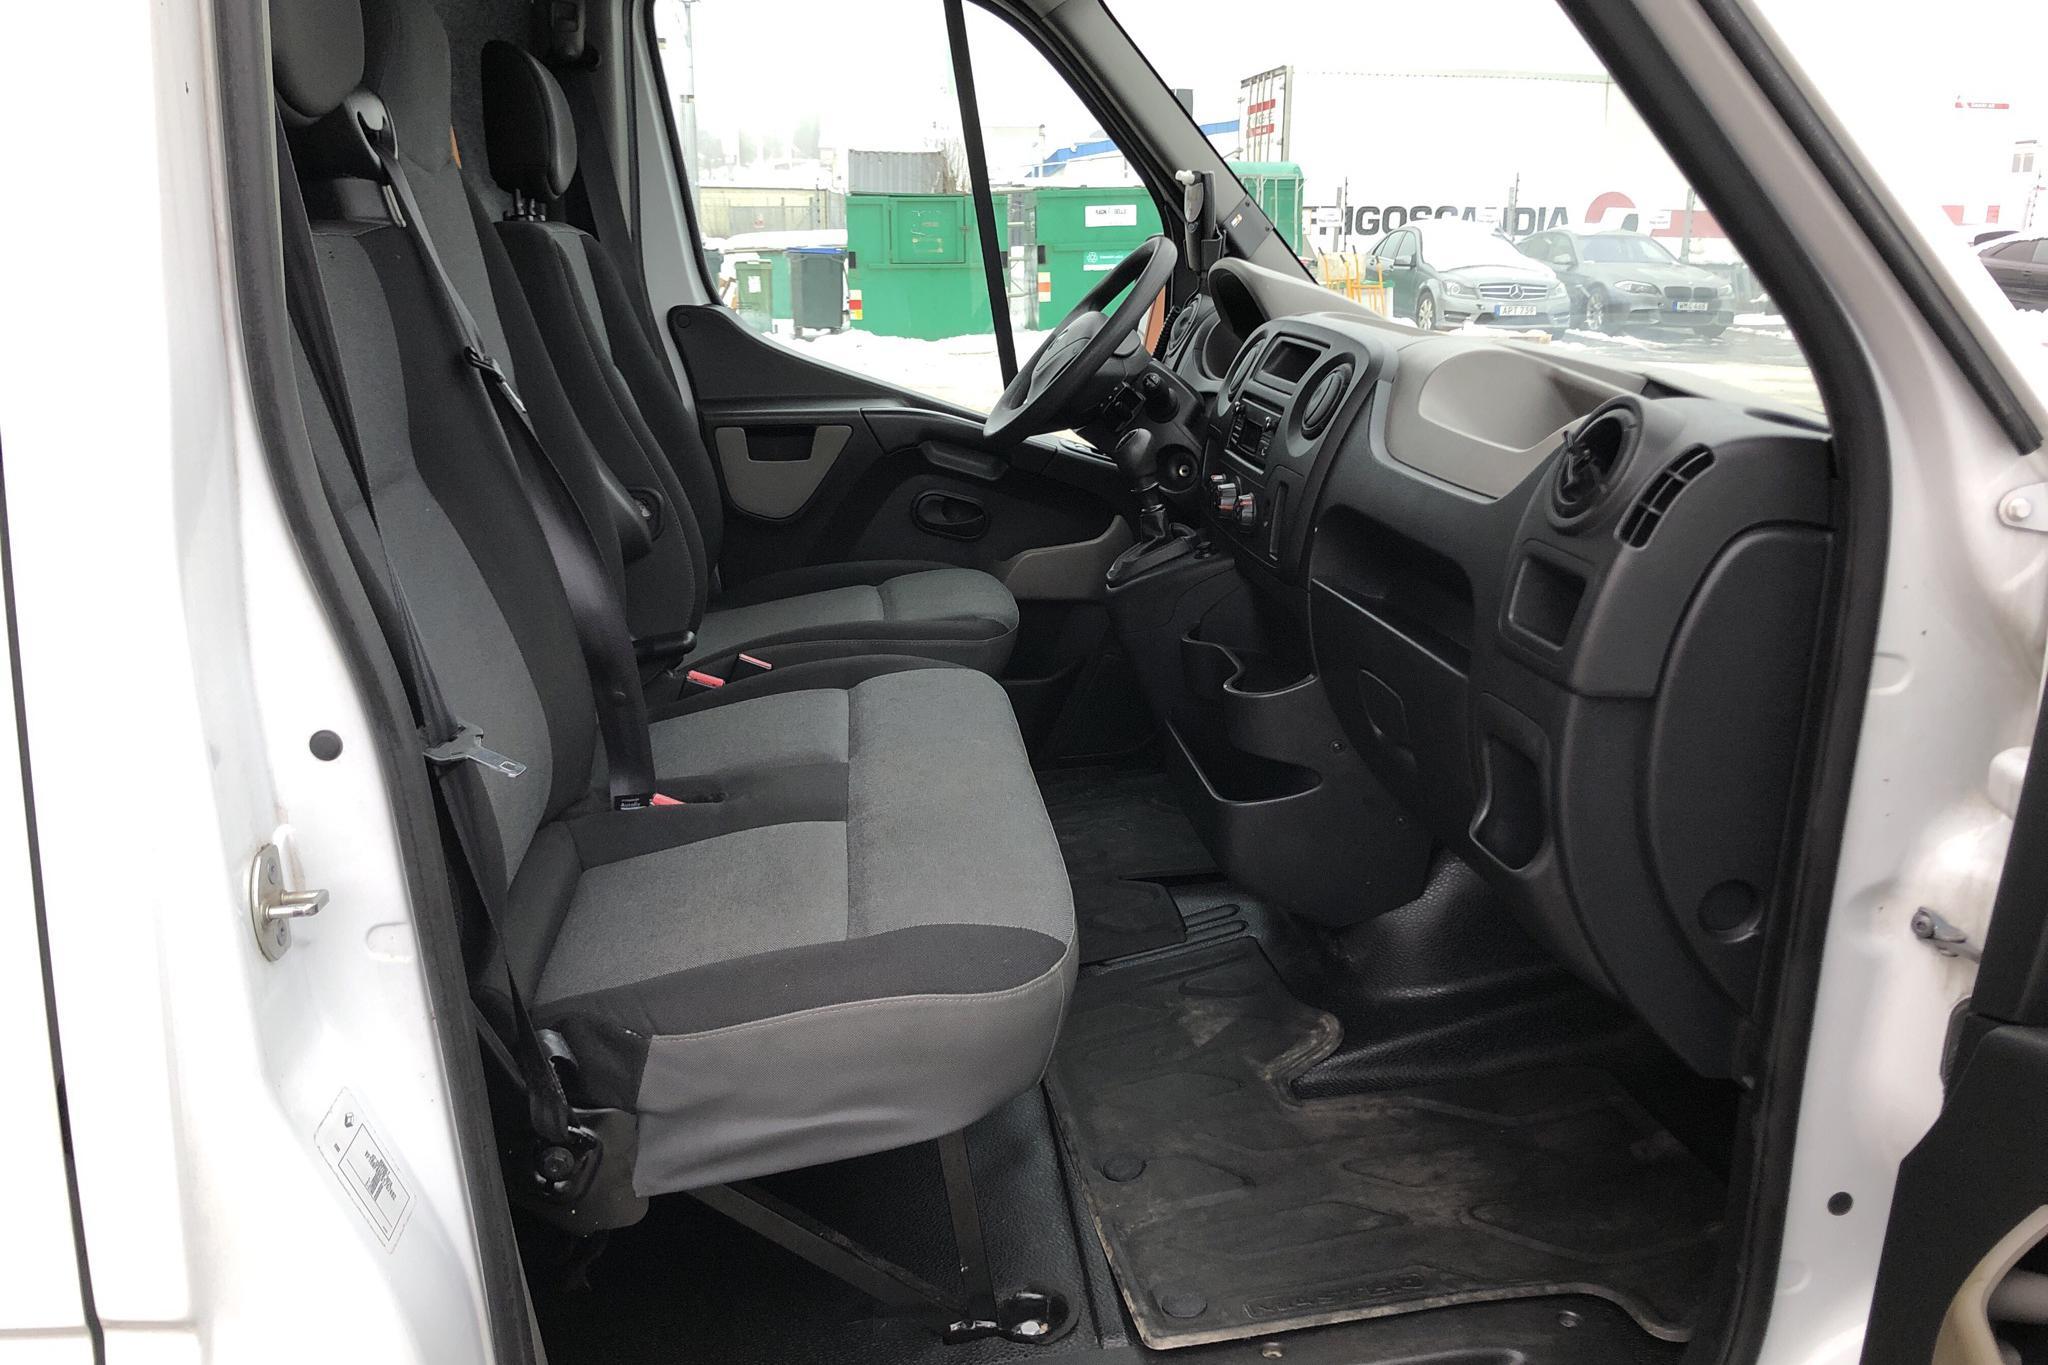 Renault Master 2.3 dCi FAP 2WD (125hk) - 2 263 mil - Manuell - vit - 2015